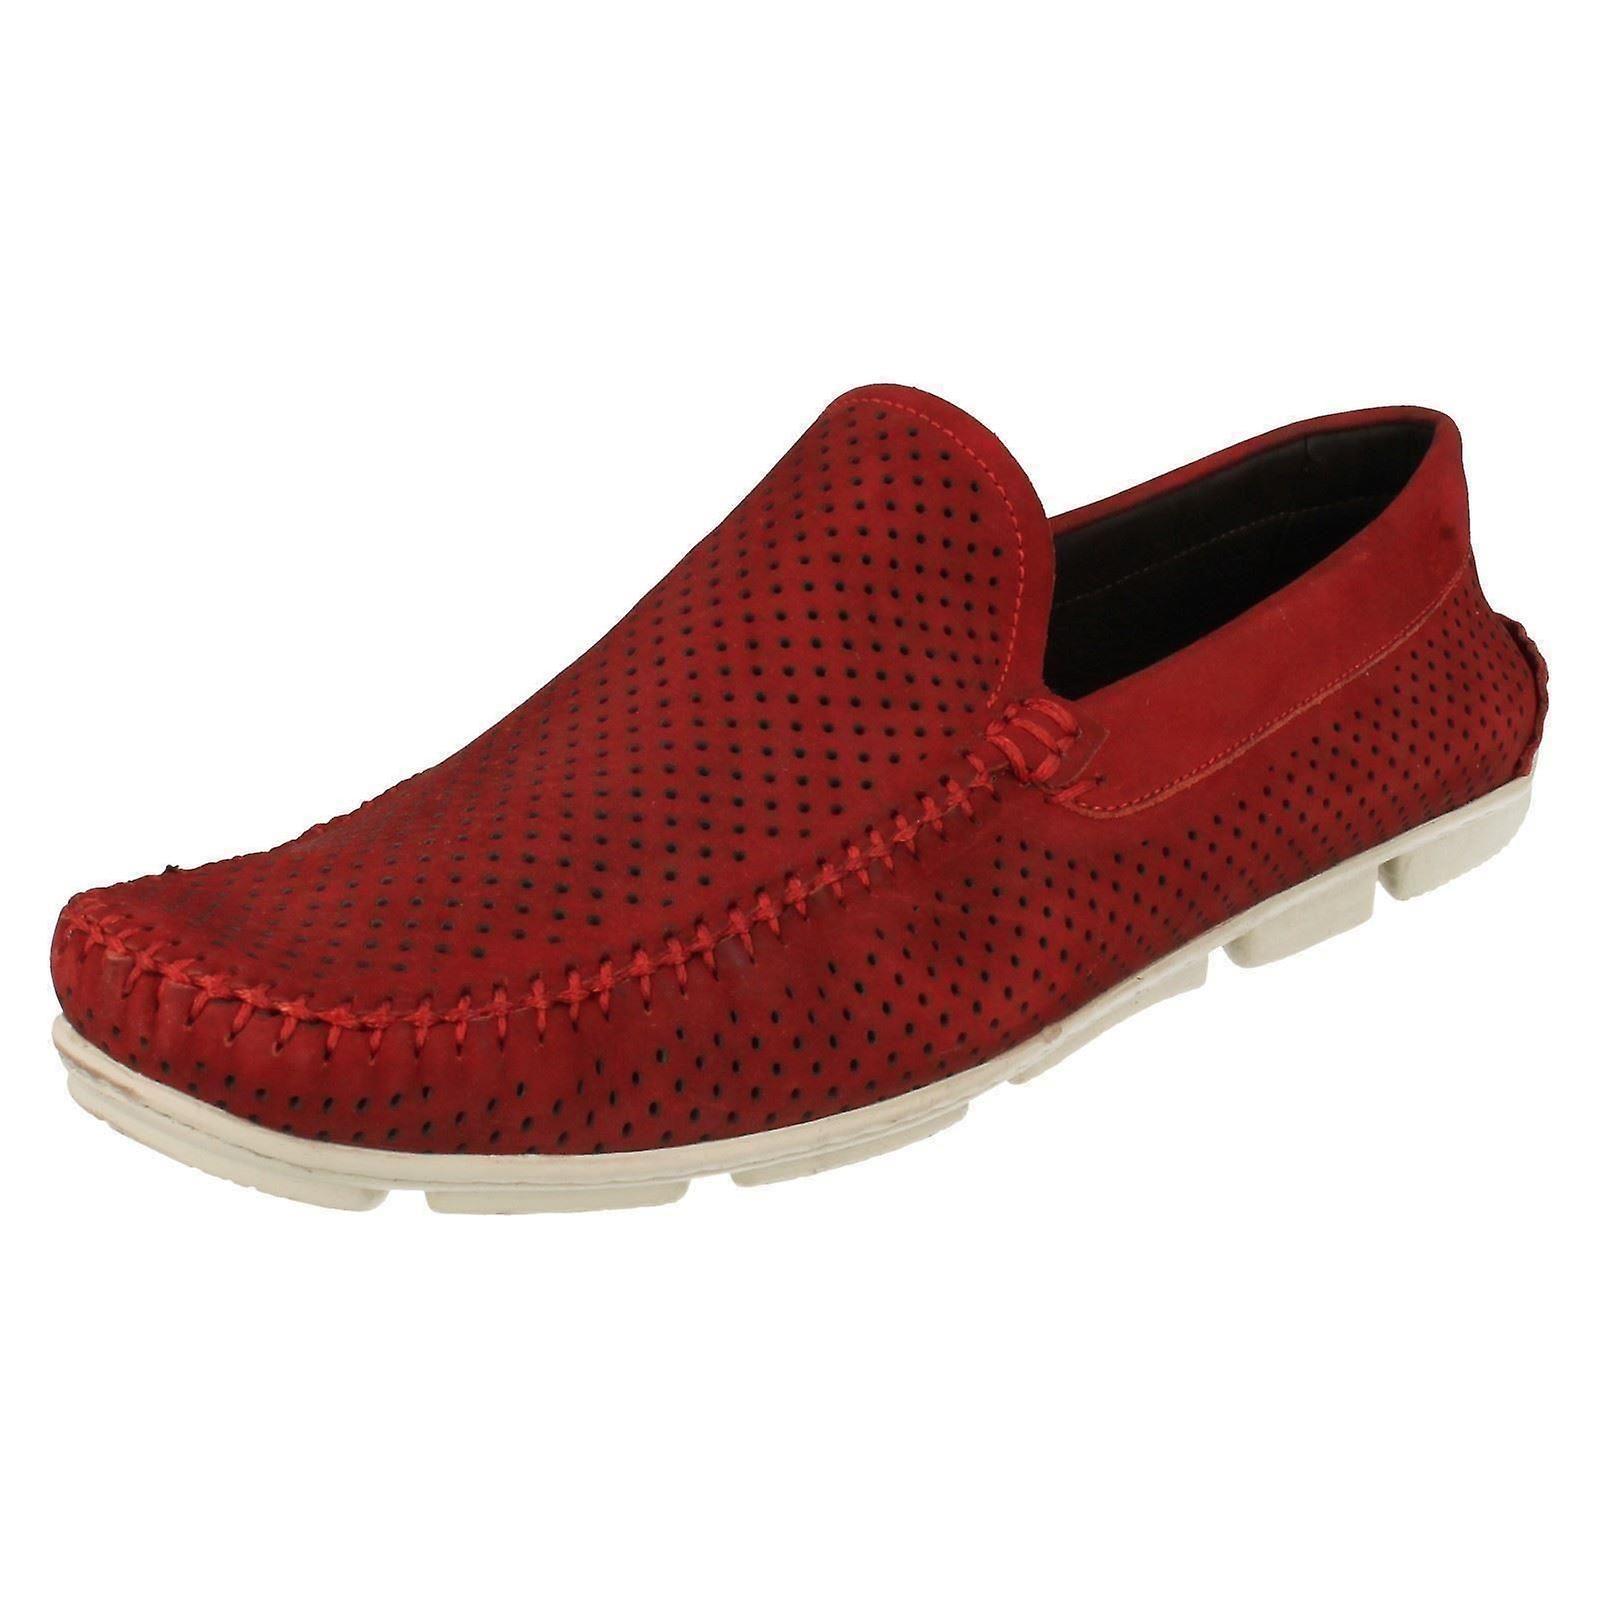 Men's Anatomic & Co Casual Slip On Coari 363655 Red Nubuck Size UK 10/44